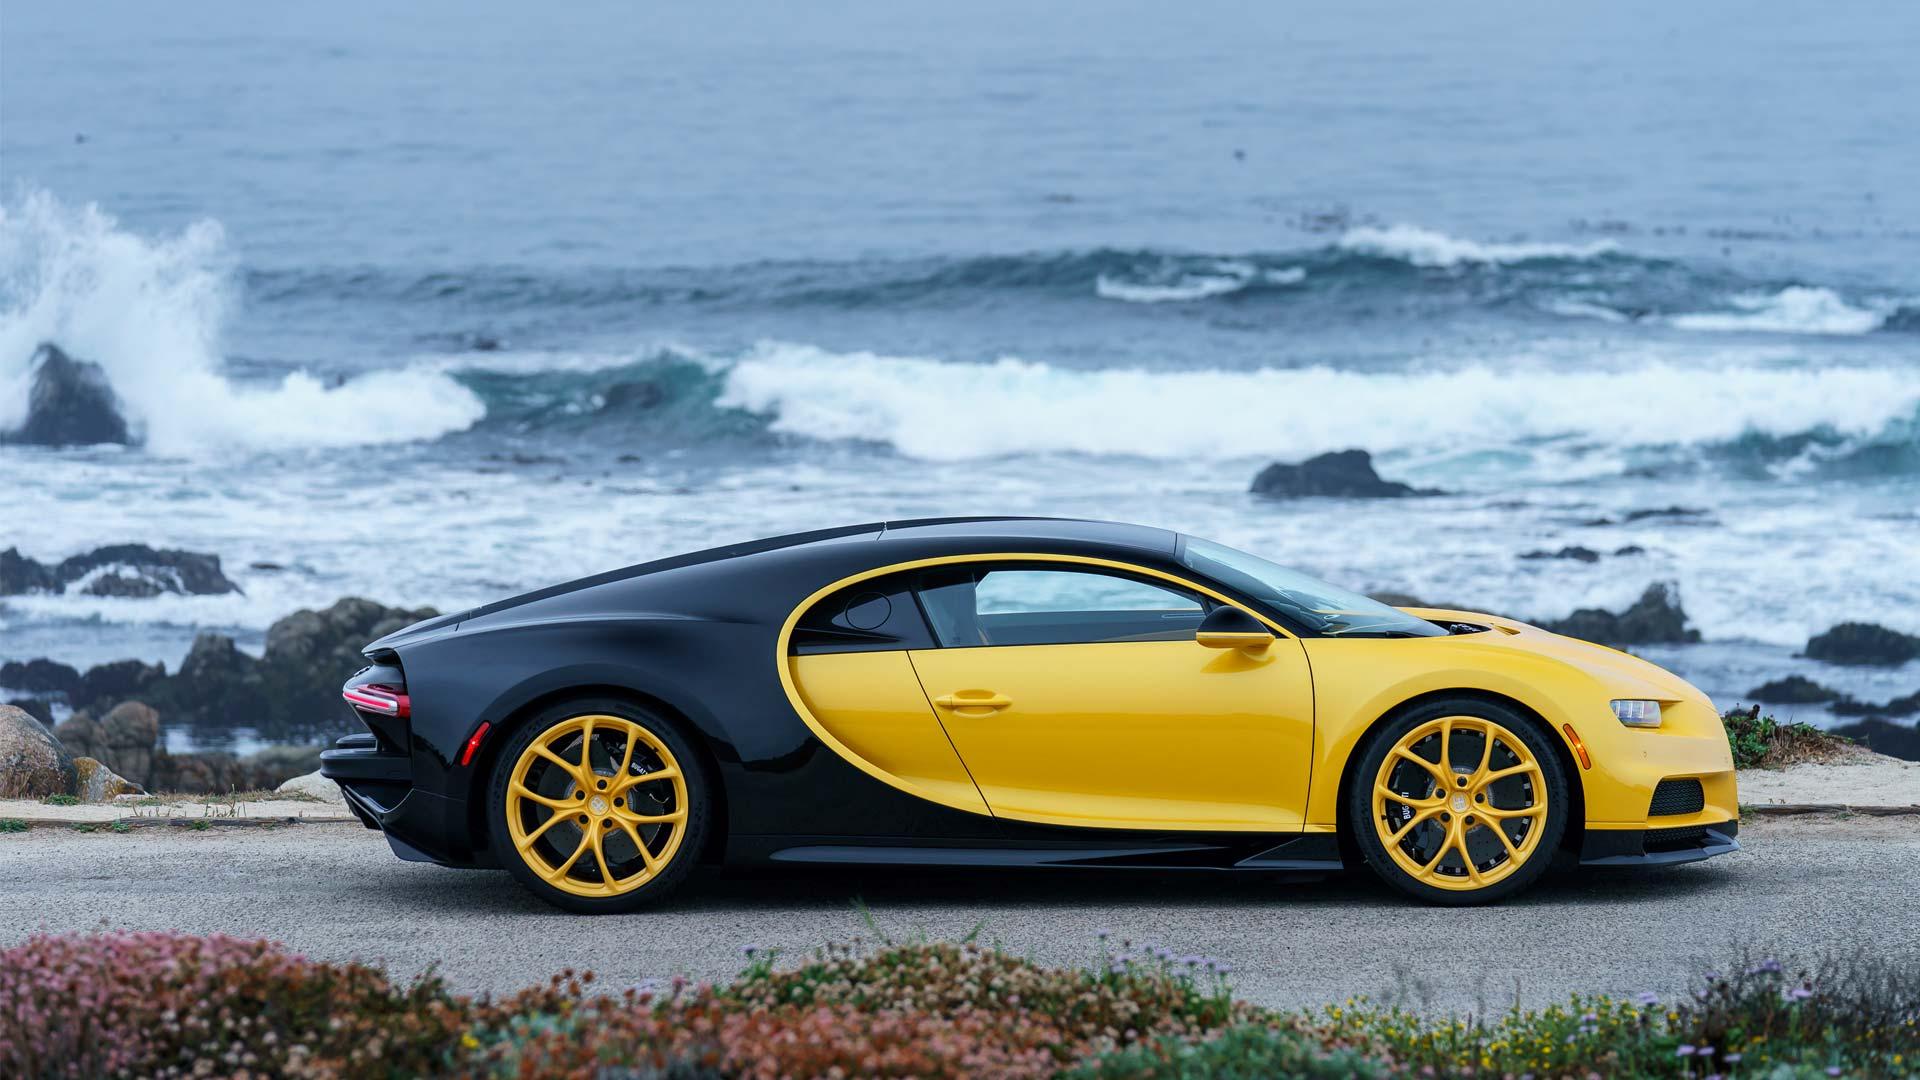 Bugatti-Chiron-US_3 Fabulous Bugatti Veyron Price In south Africa Cars Trend